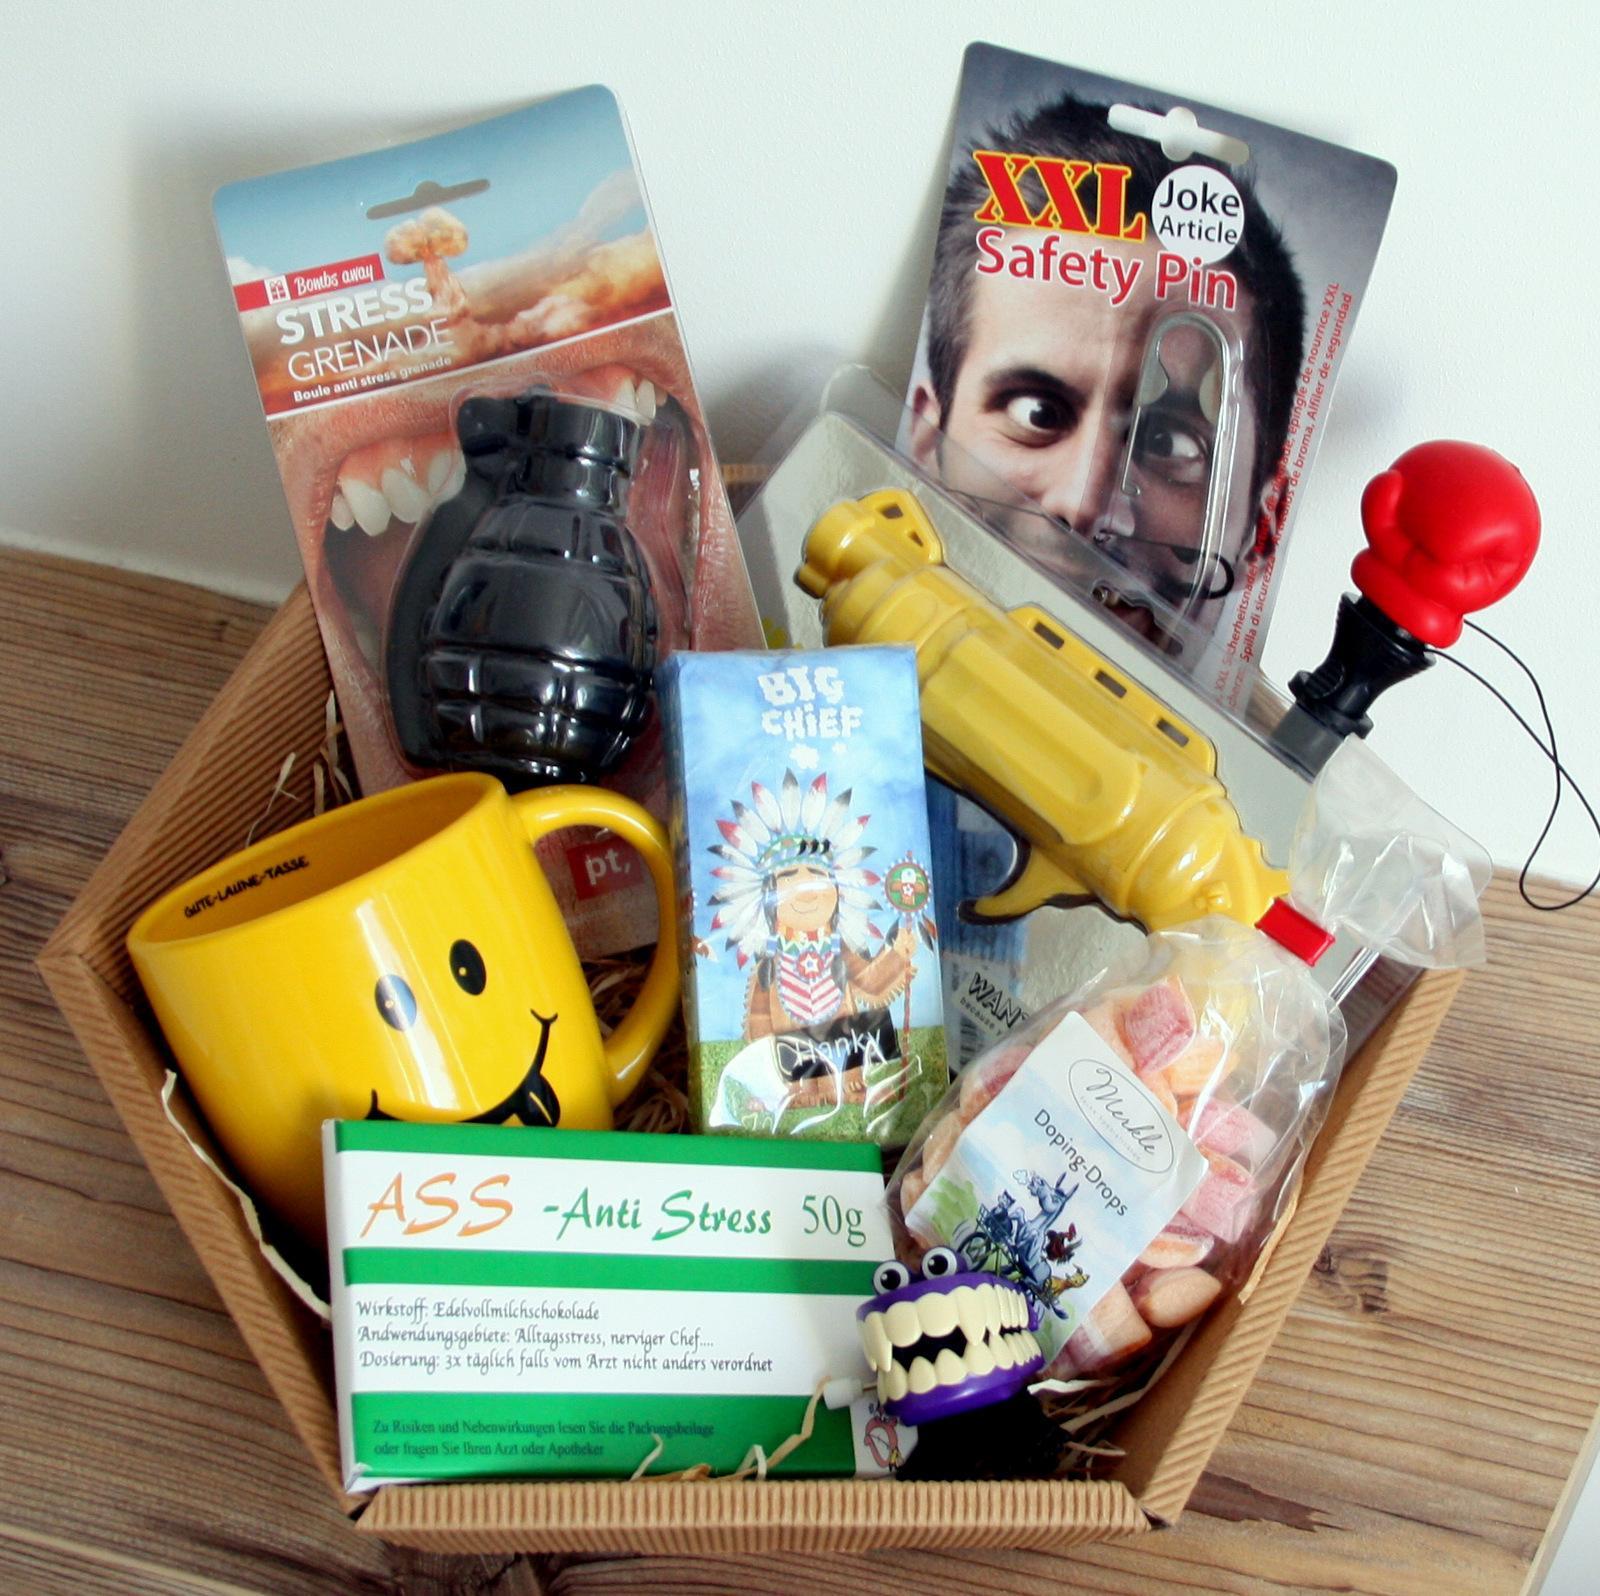 Chef Geschenke  Geschenk fur chef zum ruhestand – Beste Geschenk Website